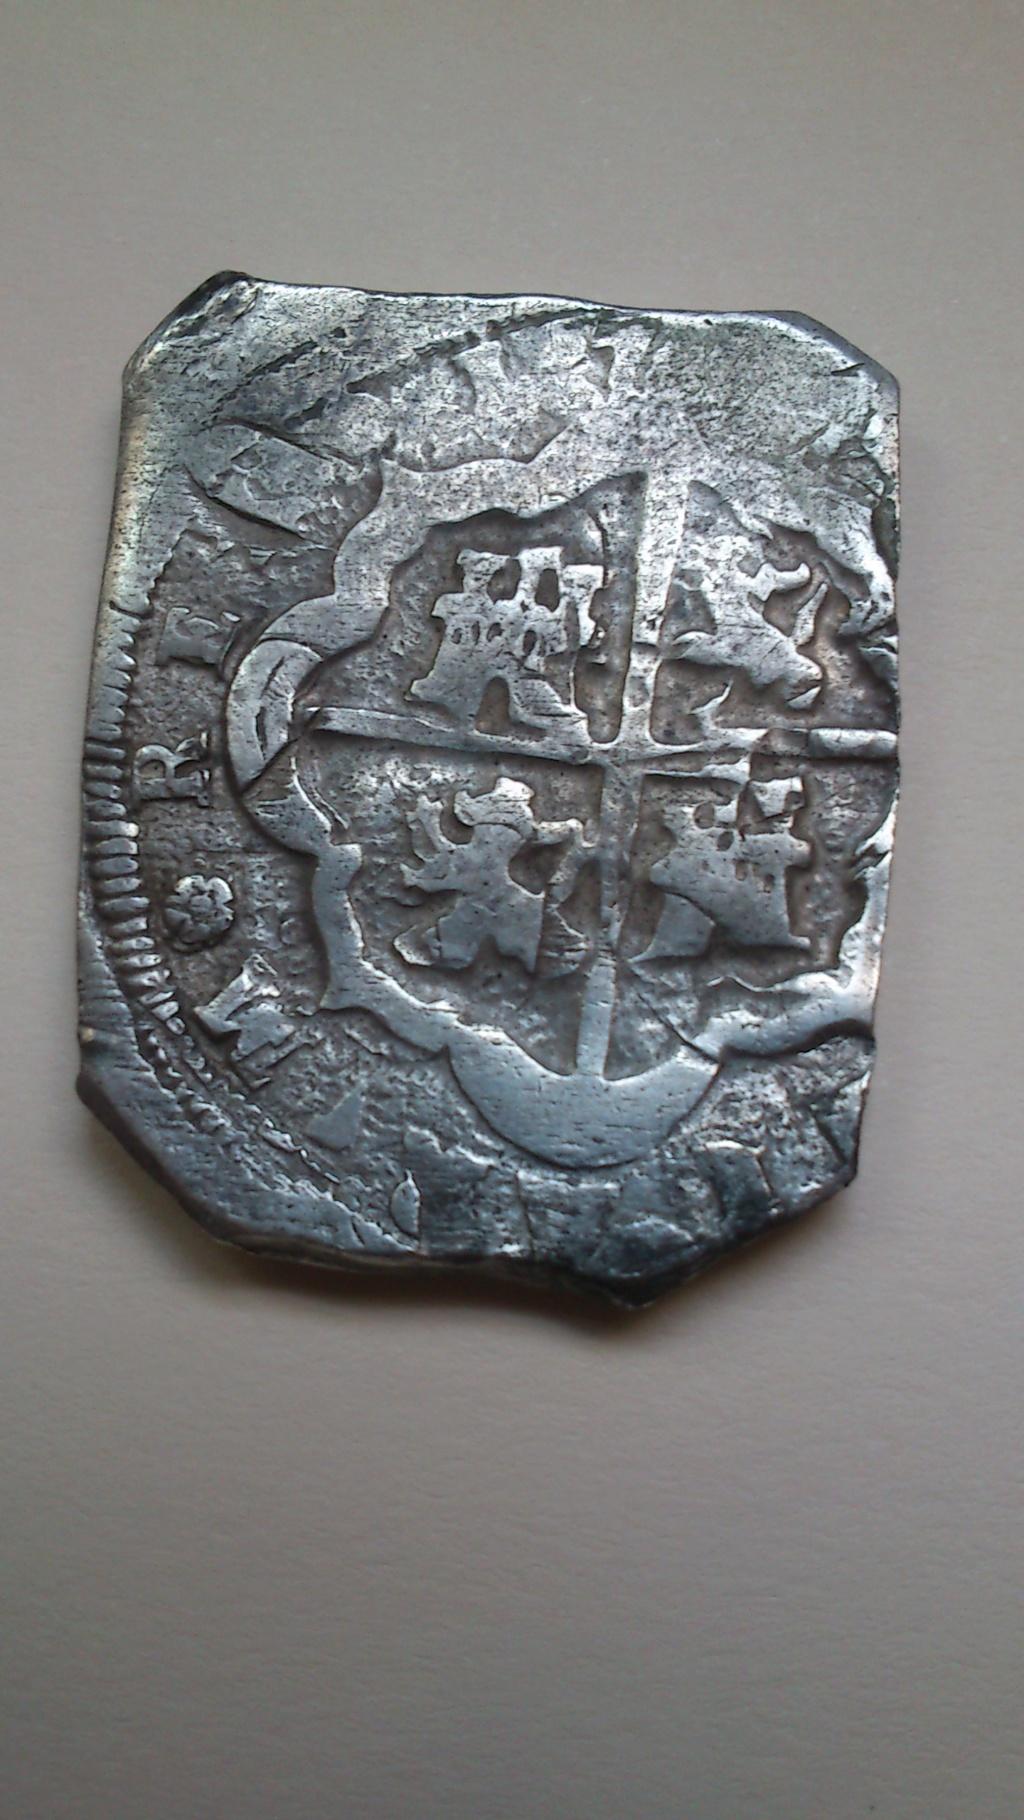 8 REALES FELIPE V 1709 CECA DE MADRID (tipo macuquina) Dsc_0051